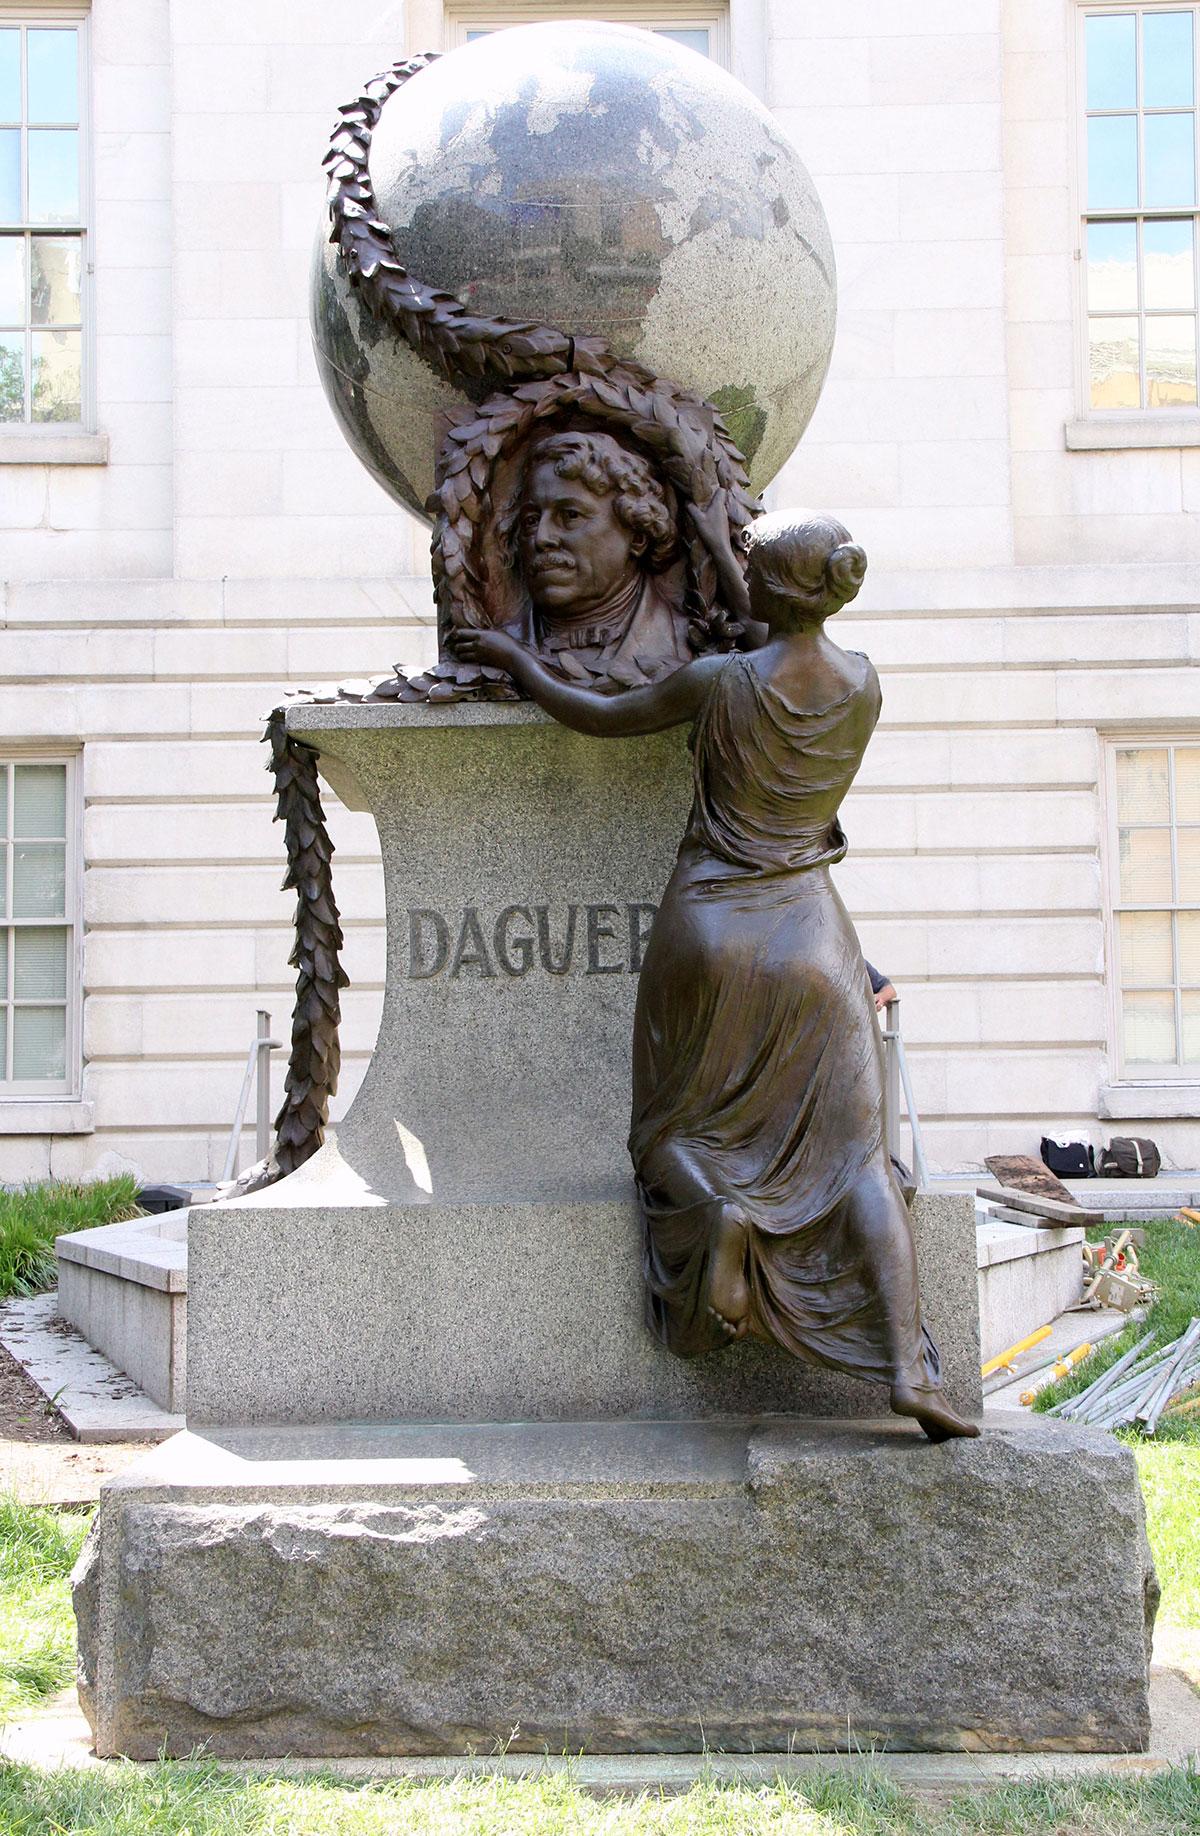 Smithsonian Daguerre Monument